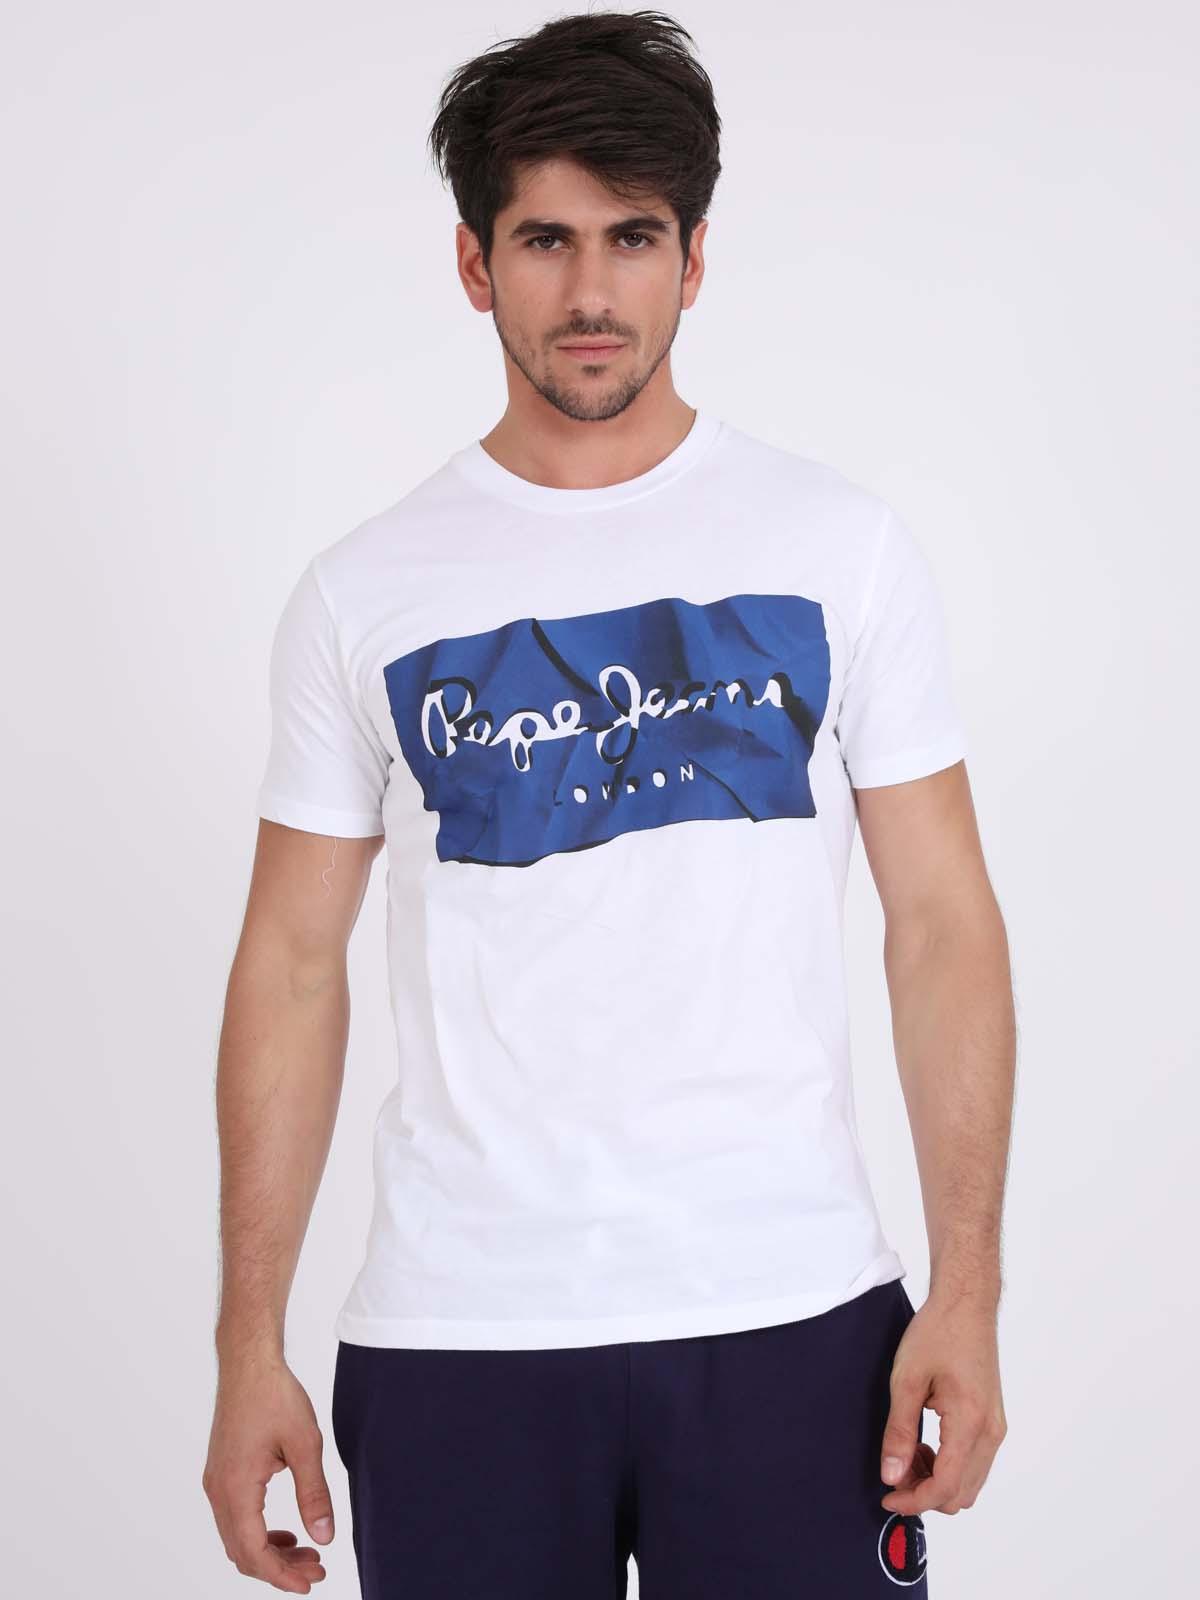 Pepe Jeans גברים - פרינט טי שרט כחול